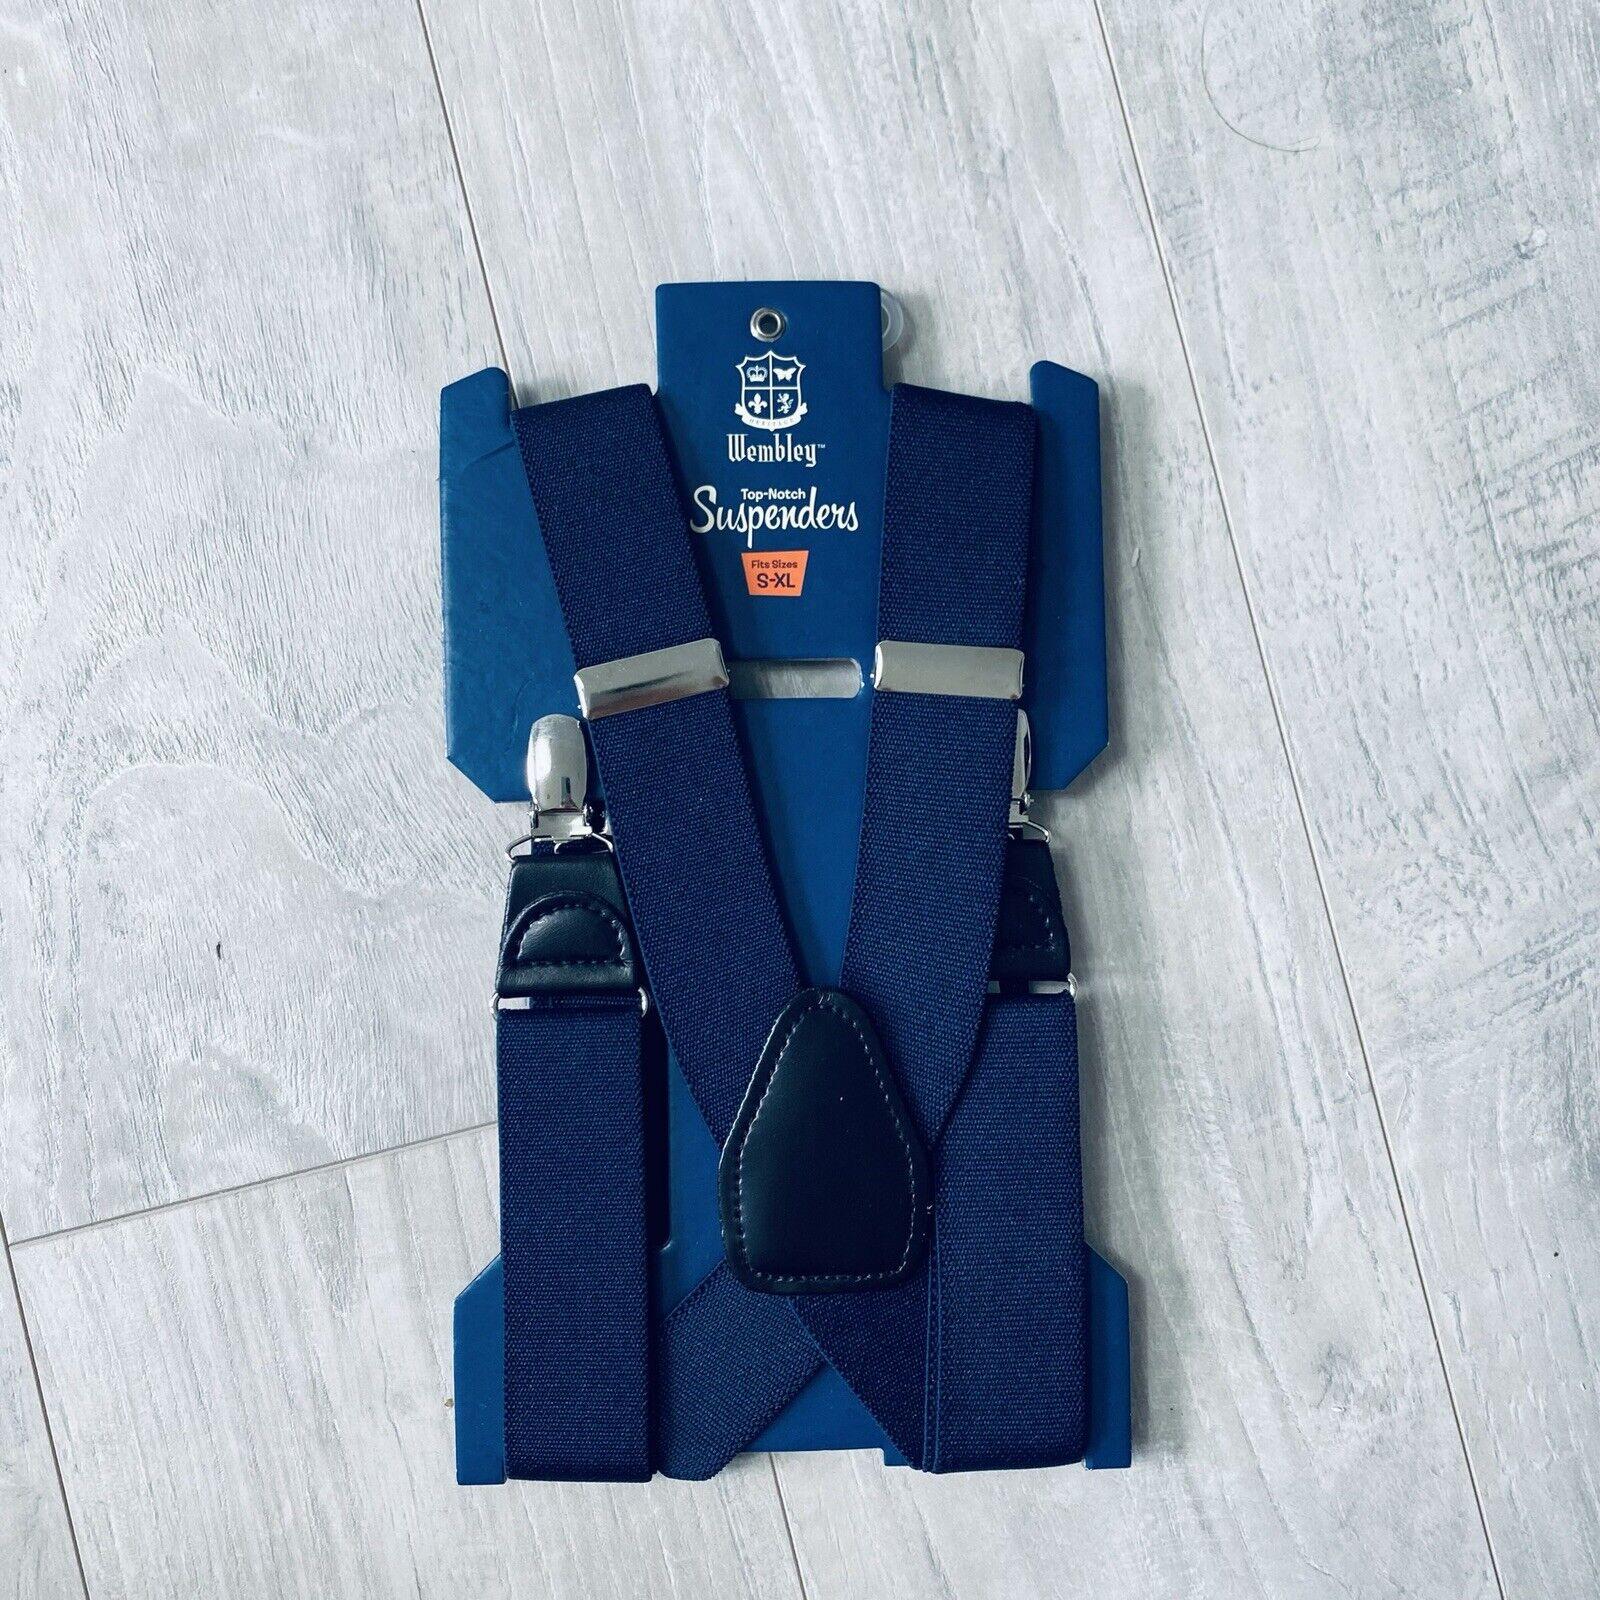 NWT Men's WEMBLEY Top-Knotch Clip On Suspenders Navy Blue, Fits S-XL